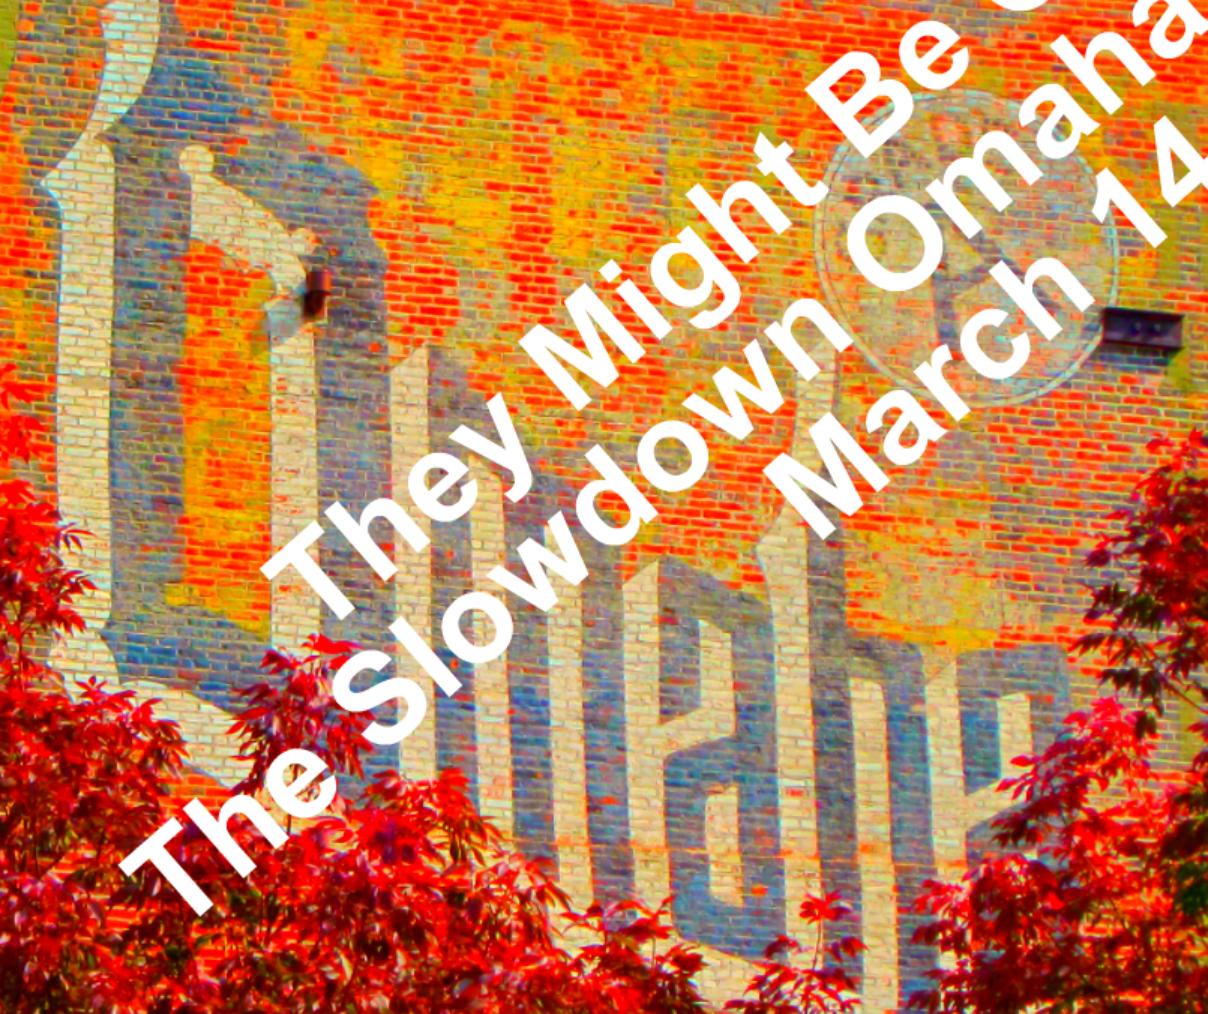 3.14 TMBG Omaha poster II.jpg